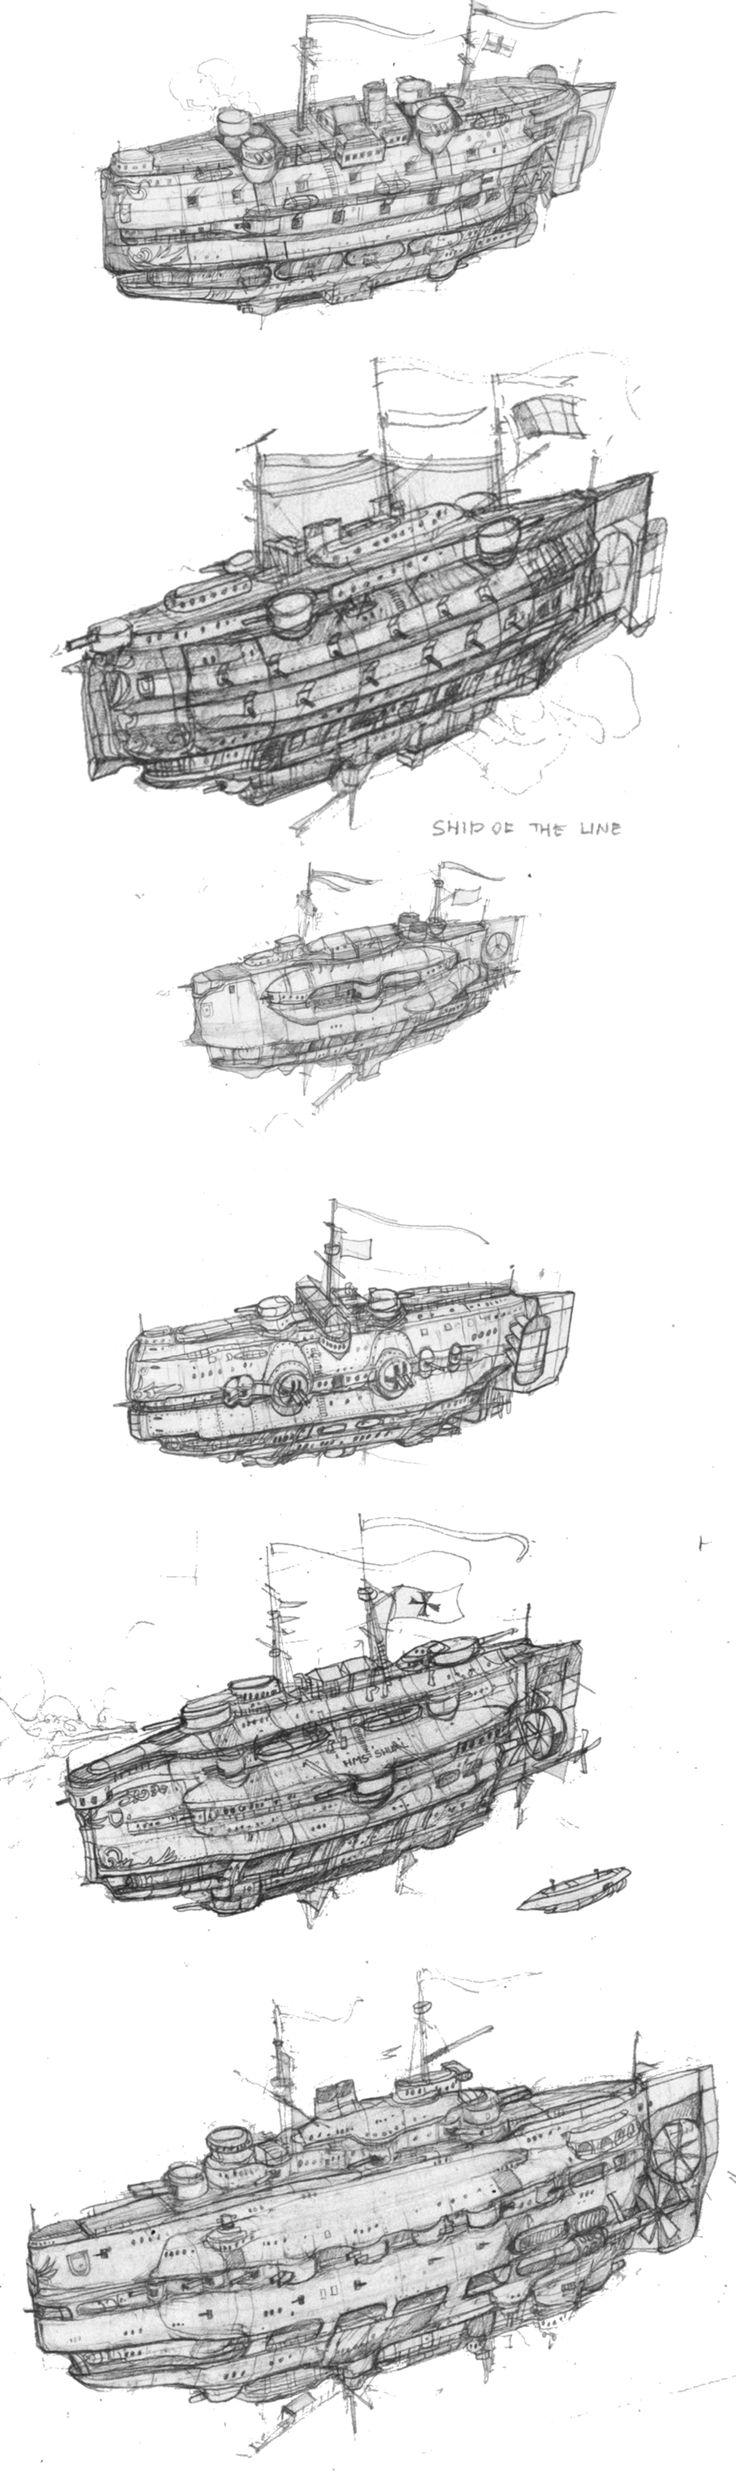 steampunk battleship - Google Search